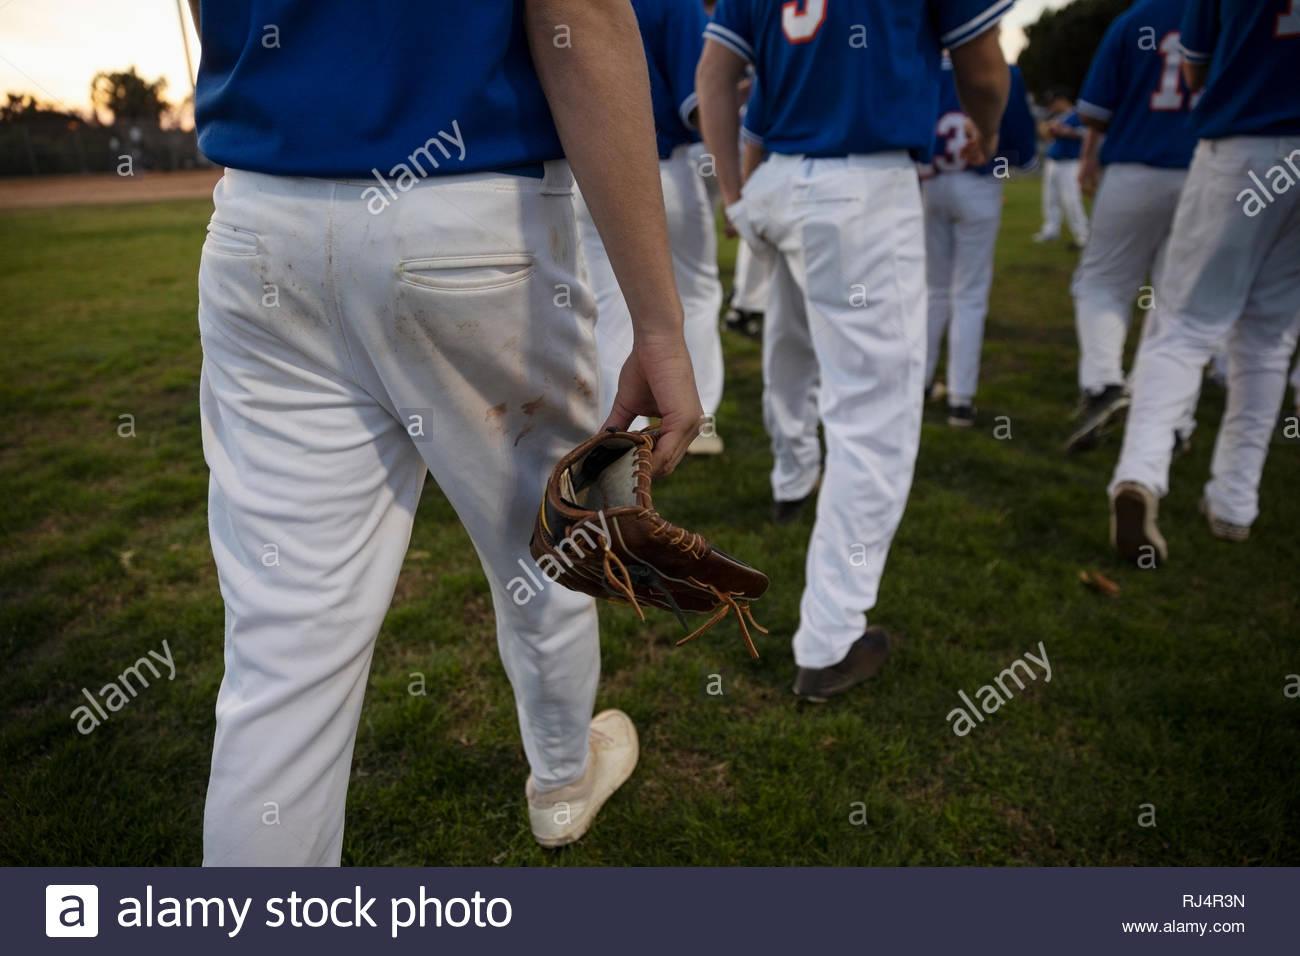 Baseball player with baseball glove walking on field - Stock Image